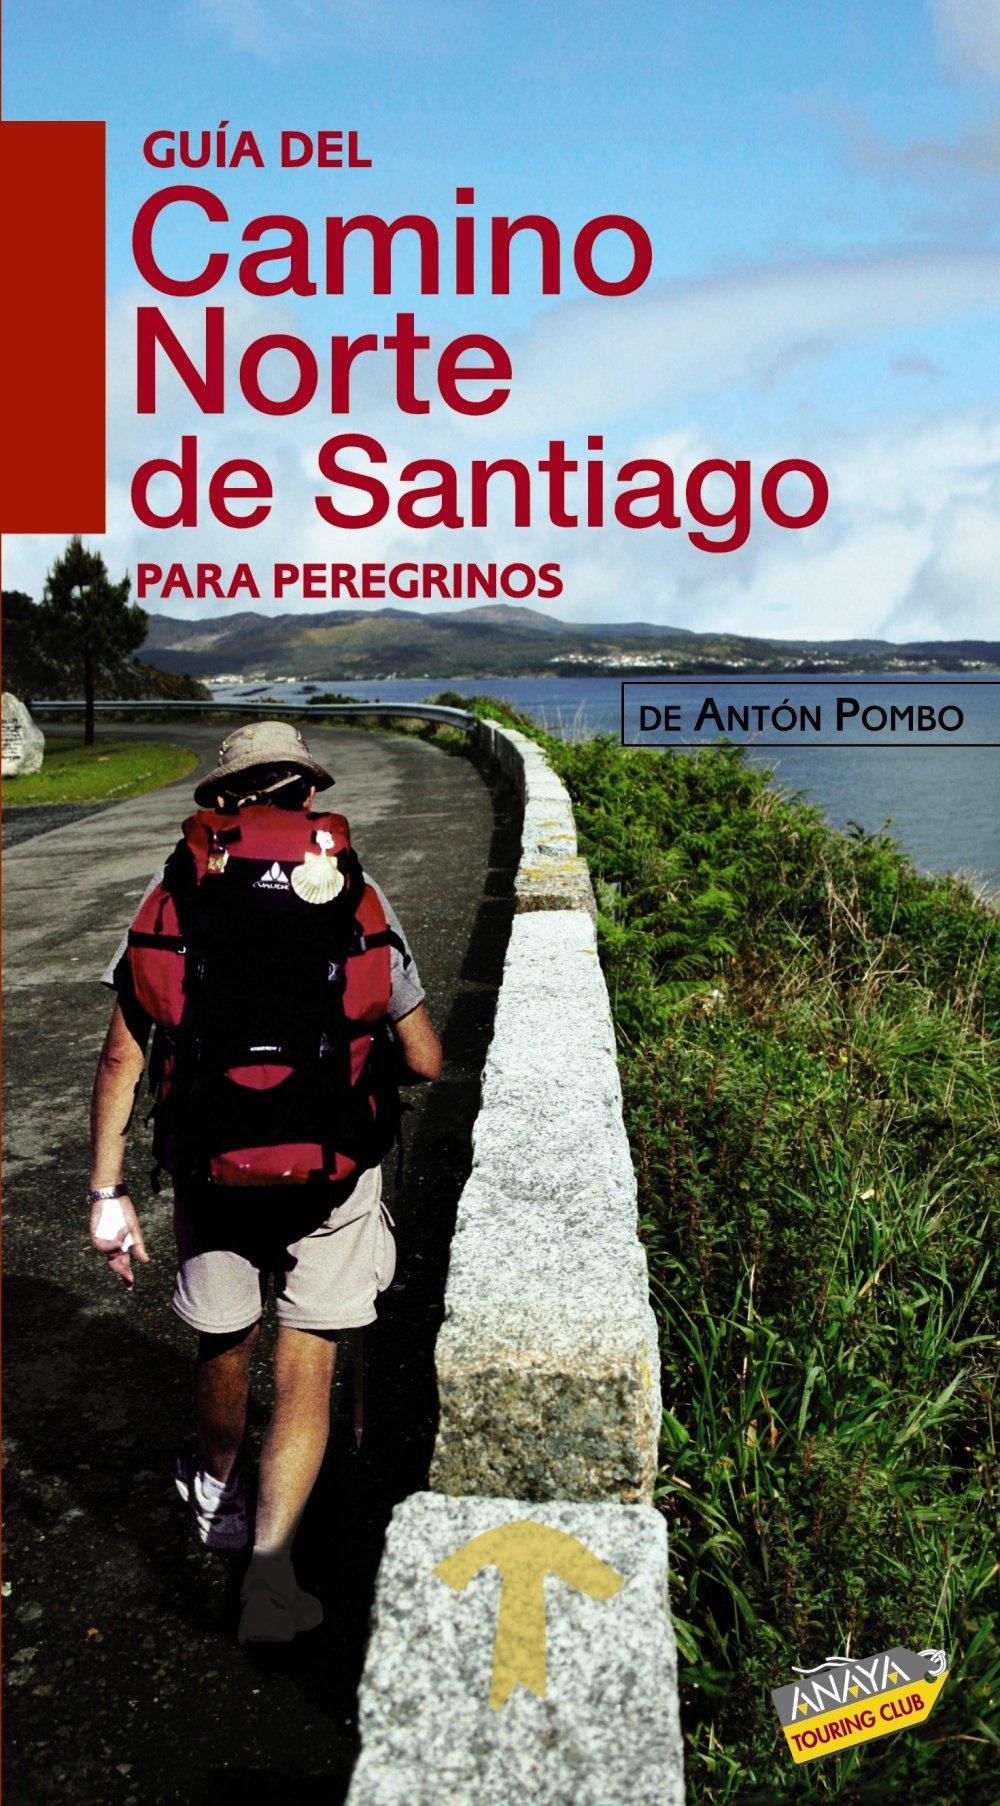 Guia del Camino Norte de Santiago para peregrinos / Guide to Santiagos Northern Route for Pilgrims (Spanish Edition) (Spanish) Paperback – May 30, 2010